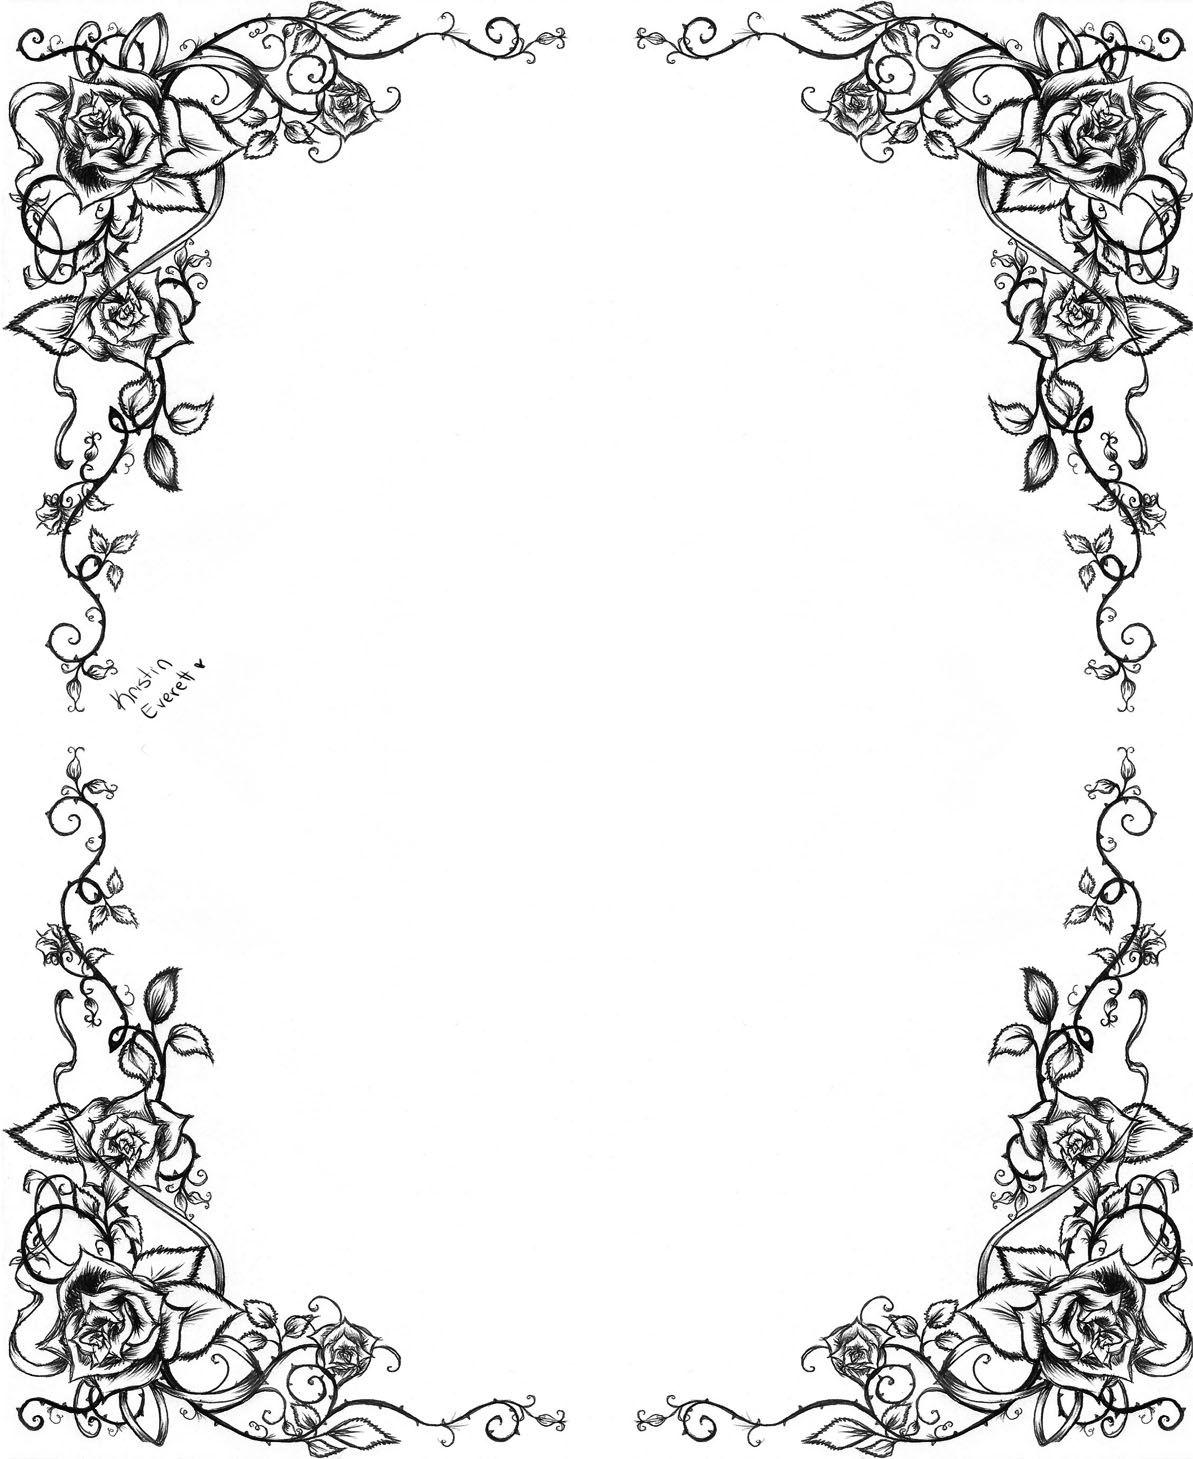 Another rose border by dreamangelkristi viantart on